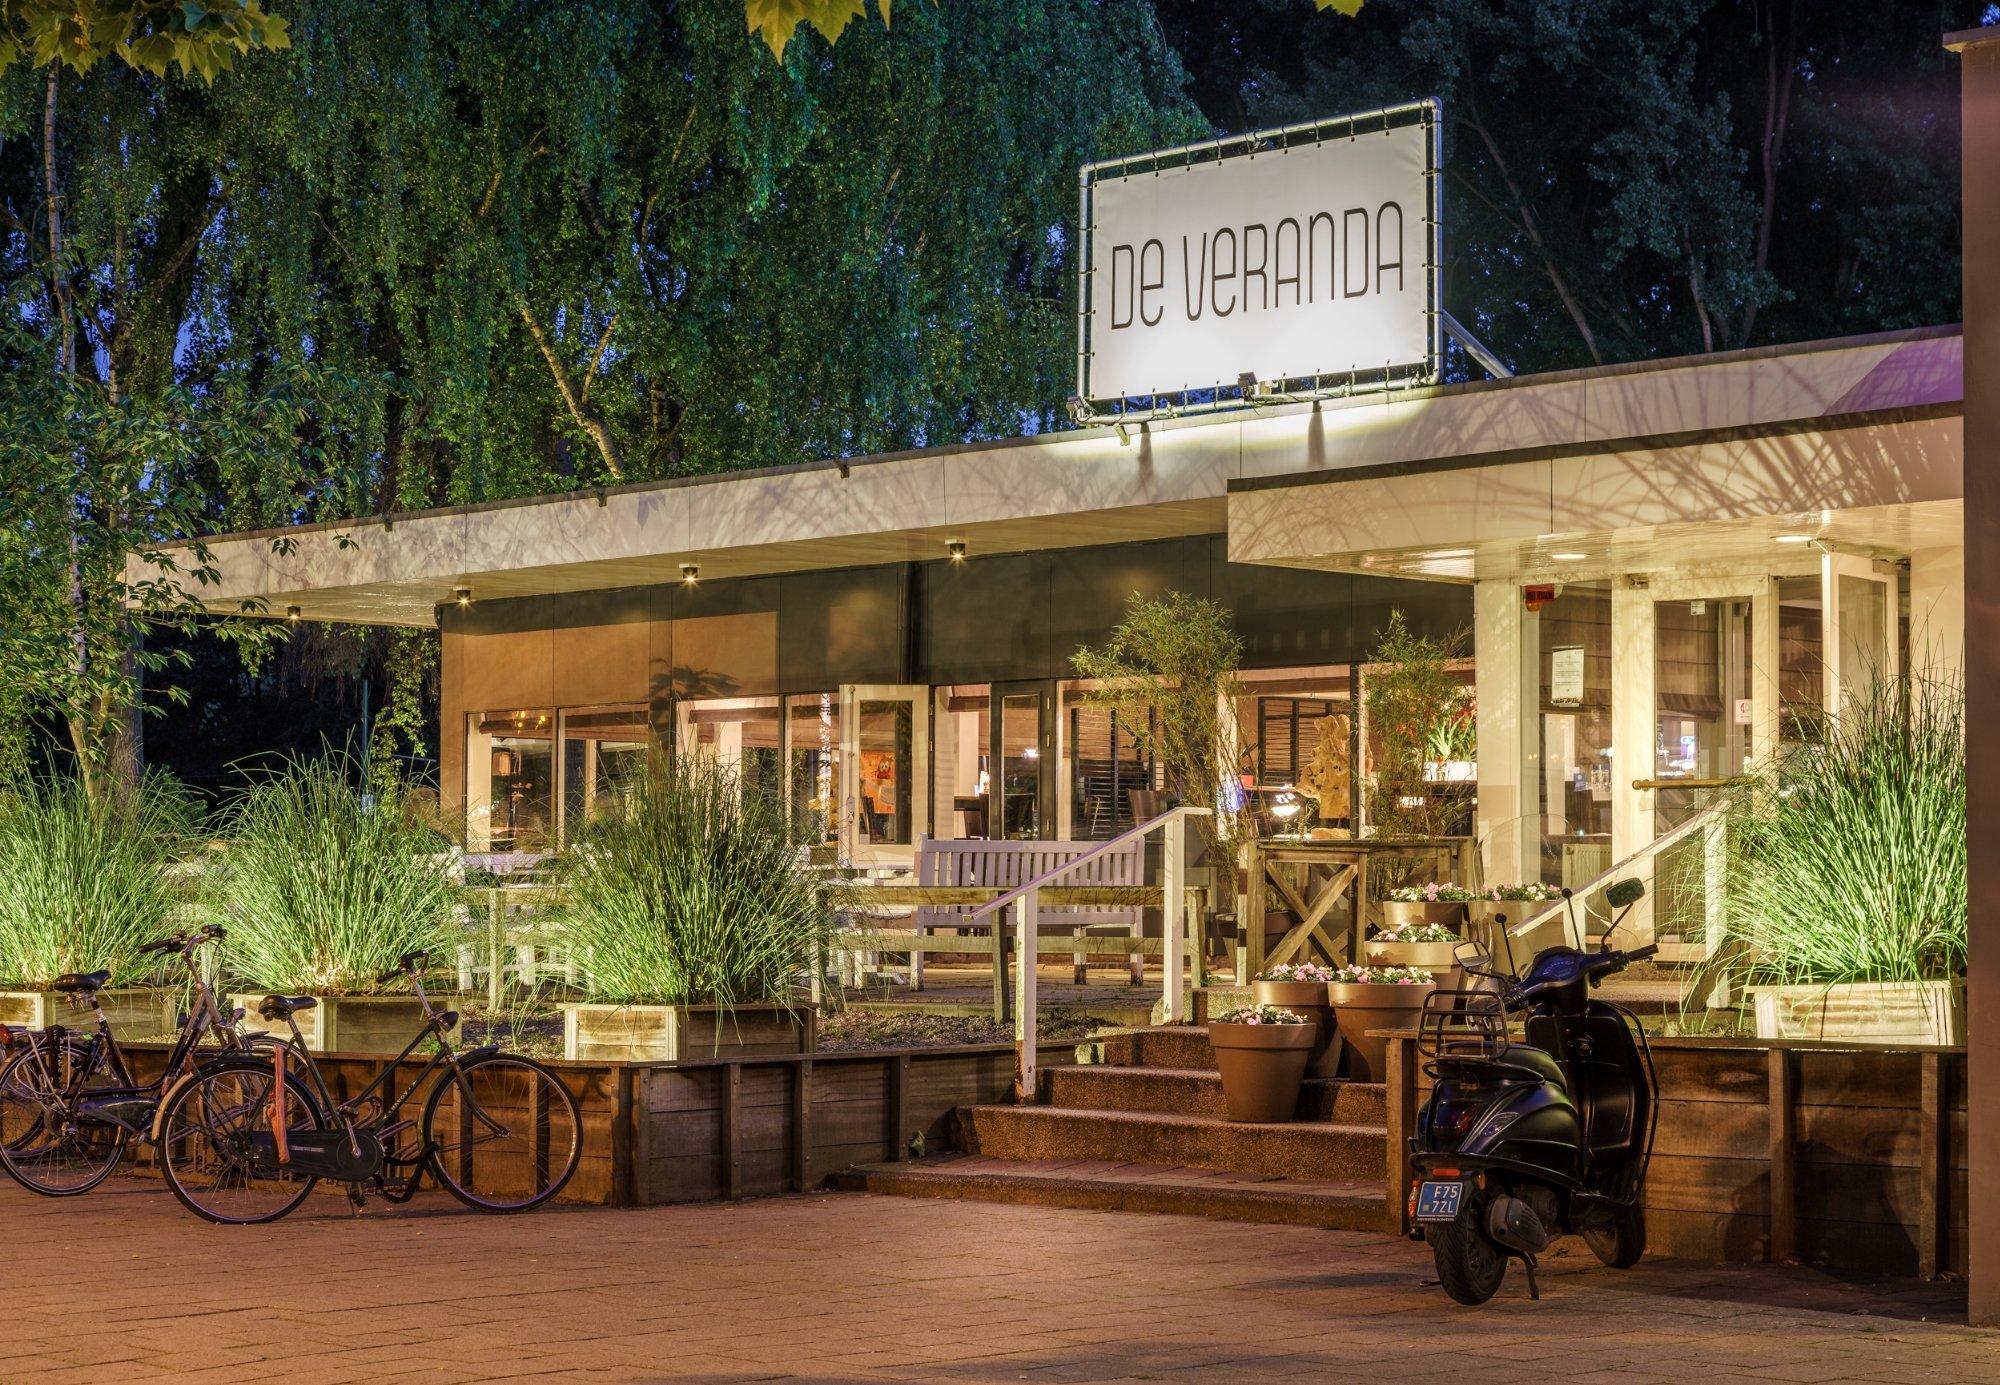 De veranda amsterdam restaurant bewertungen for Photos de veranda